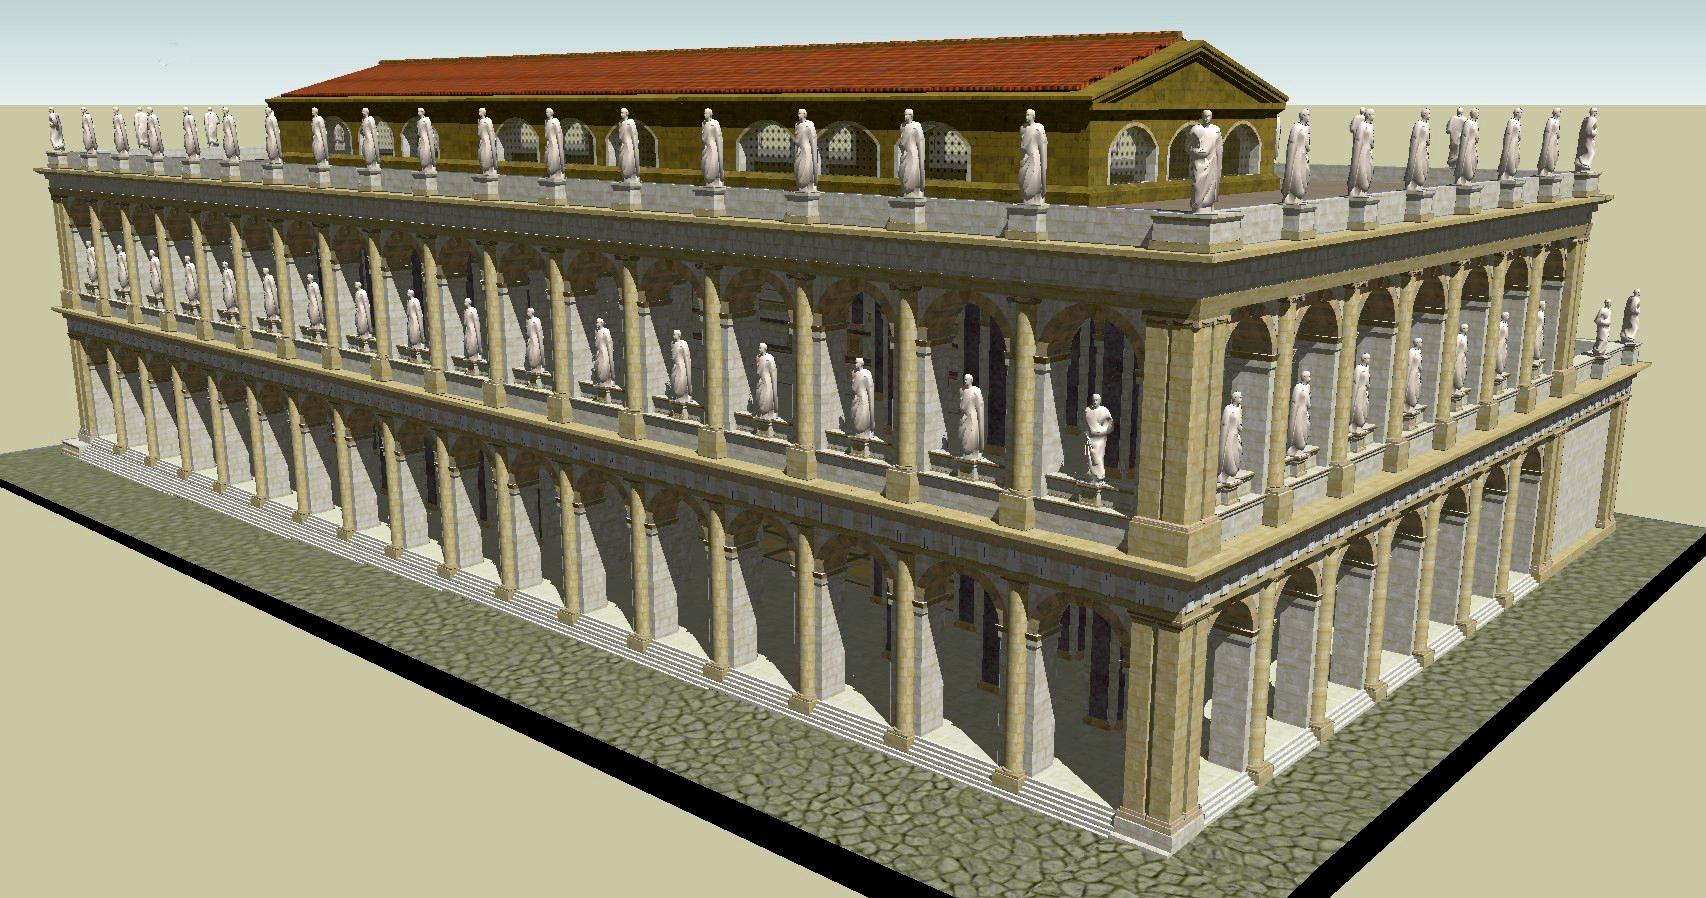 File:Basilica Julia.jpg - Wikimedia Commons